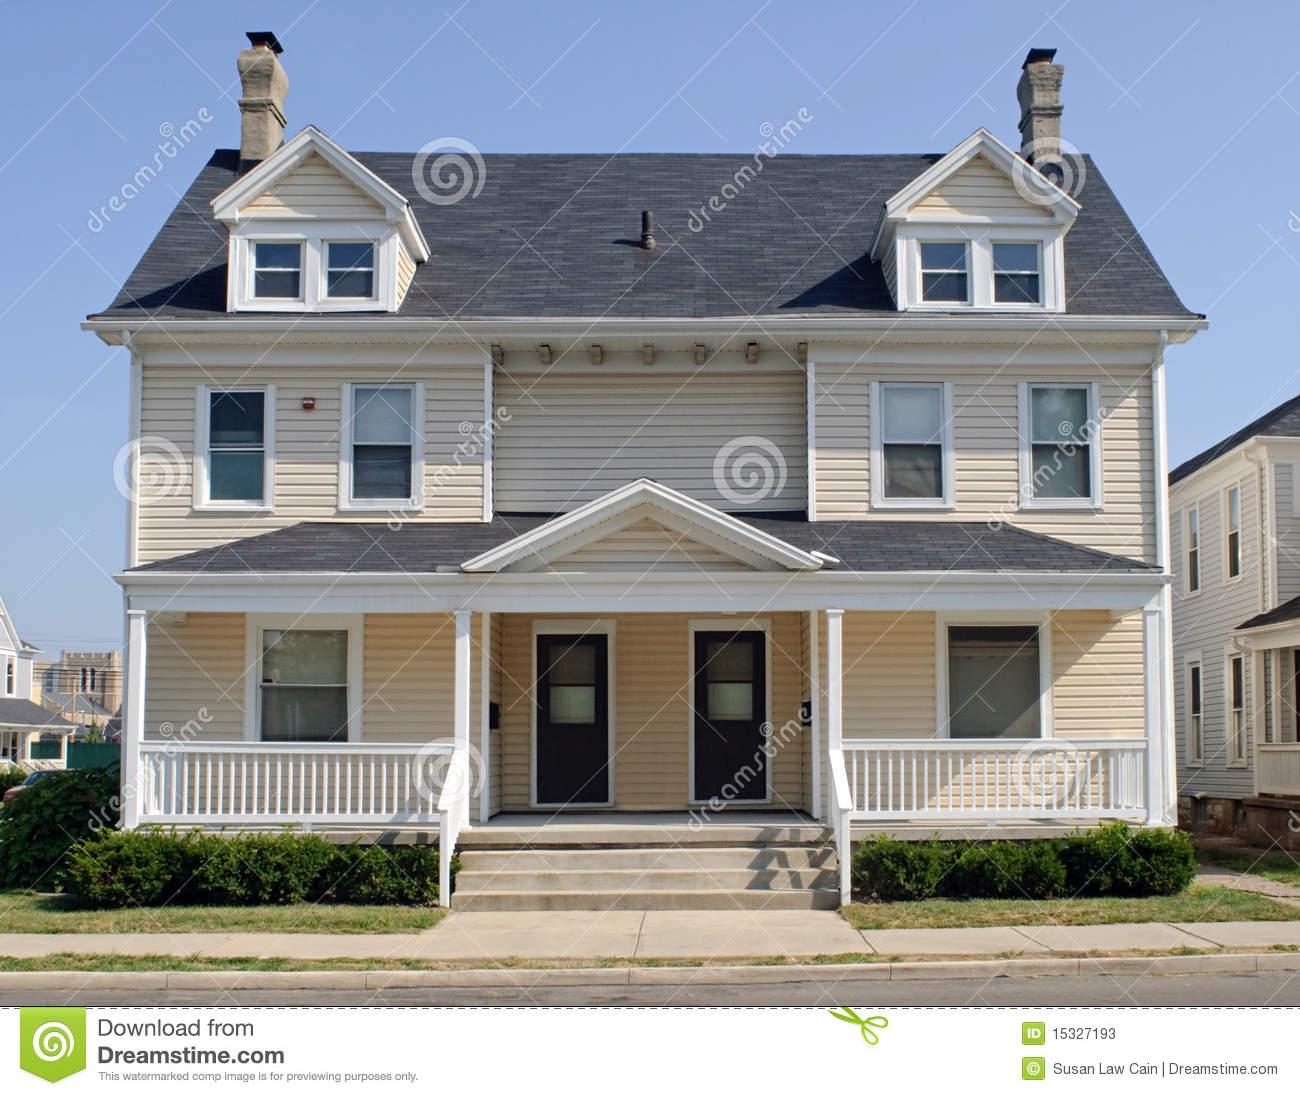 Duplex House Stock Photos, Images, & Pictures.